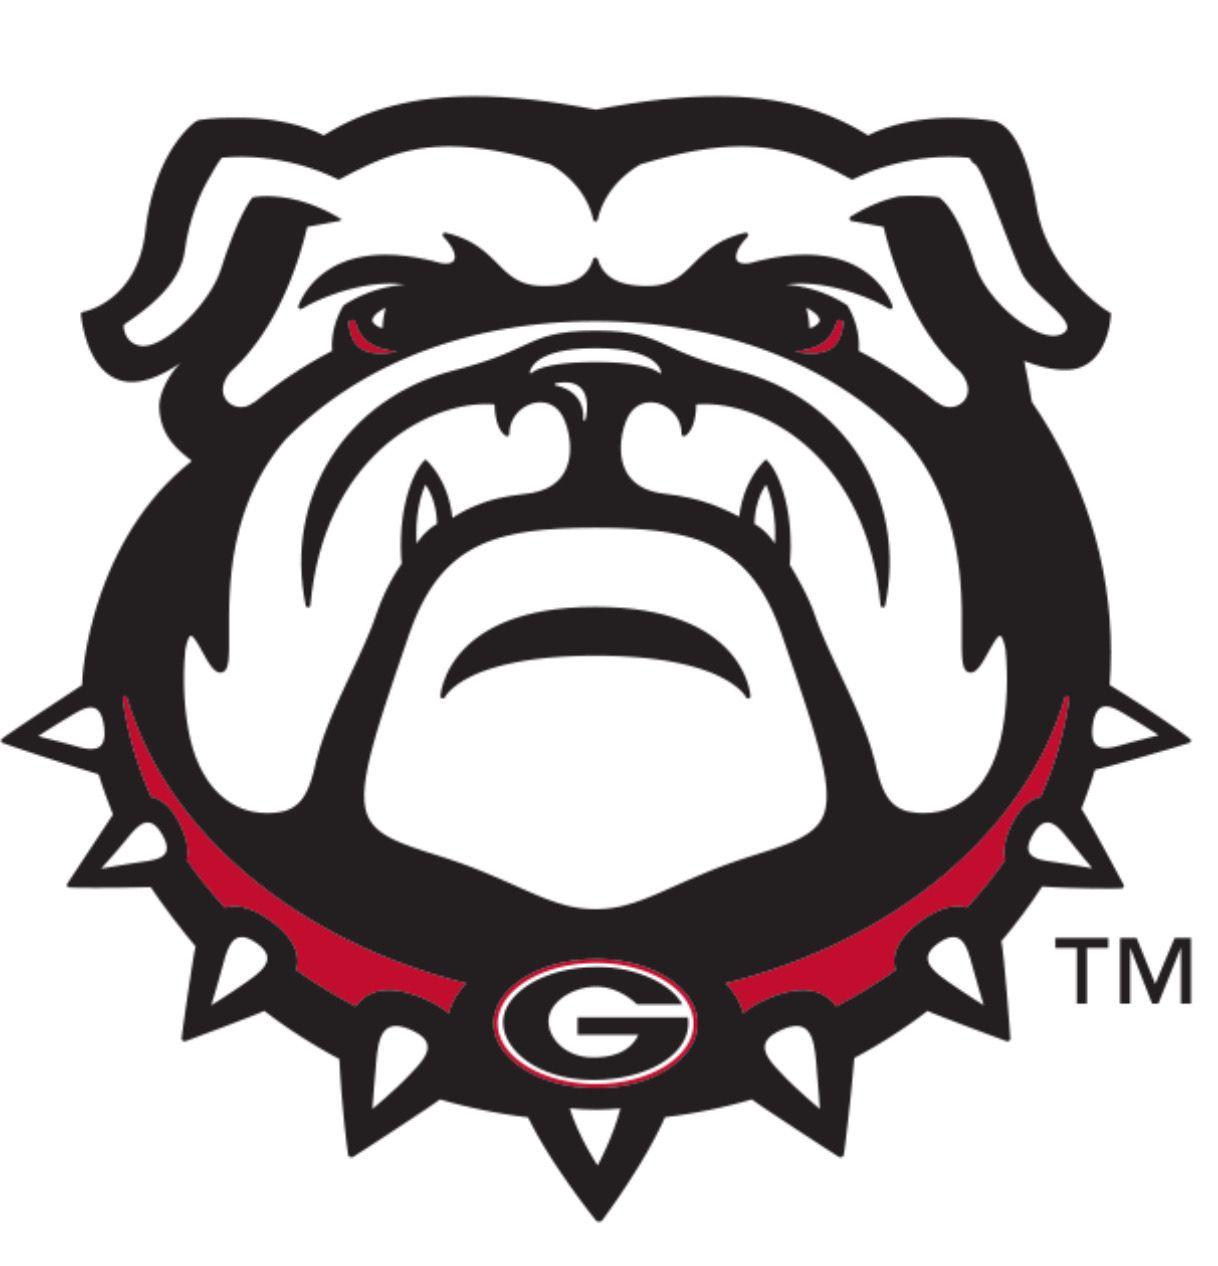 hight resolution of high school mascots car tags university of georgia business signs georgia bulldogs